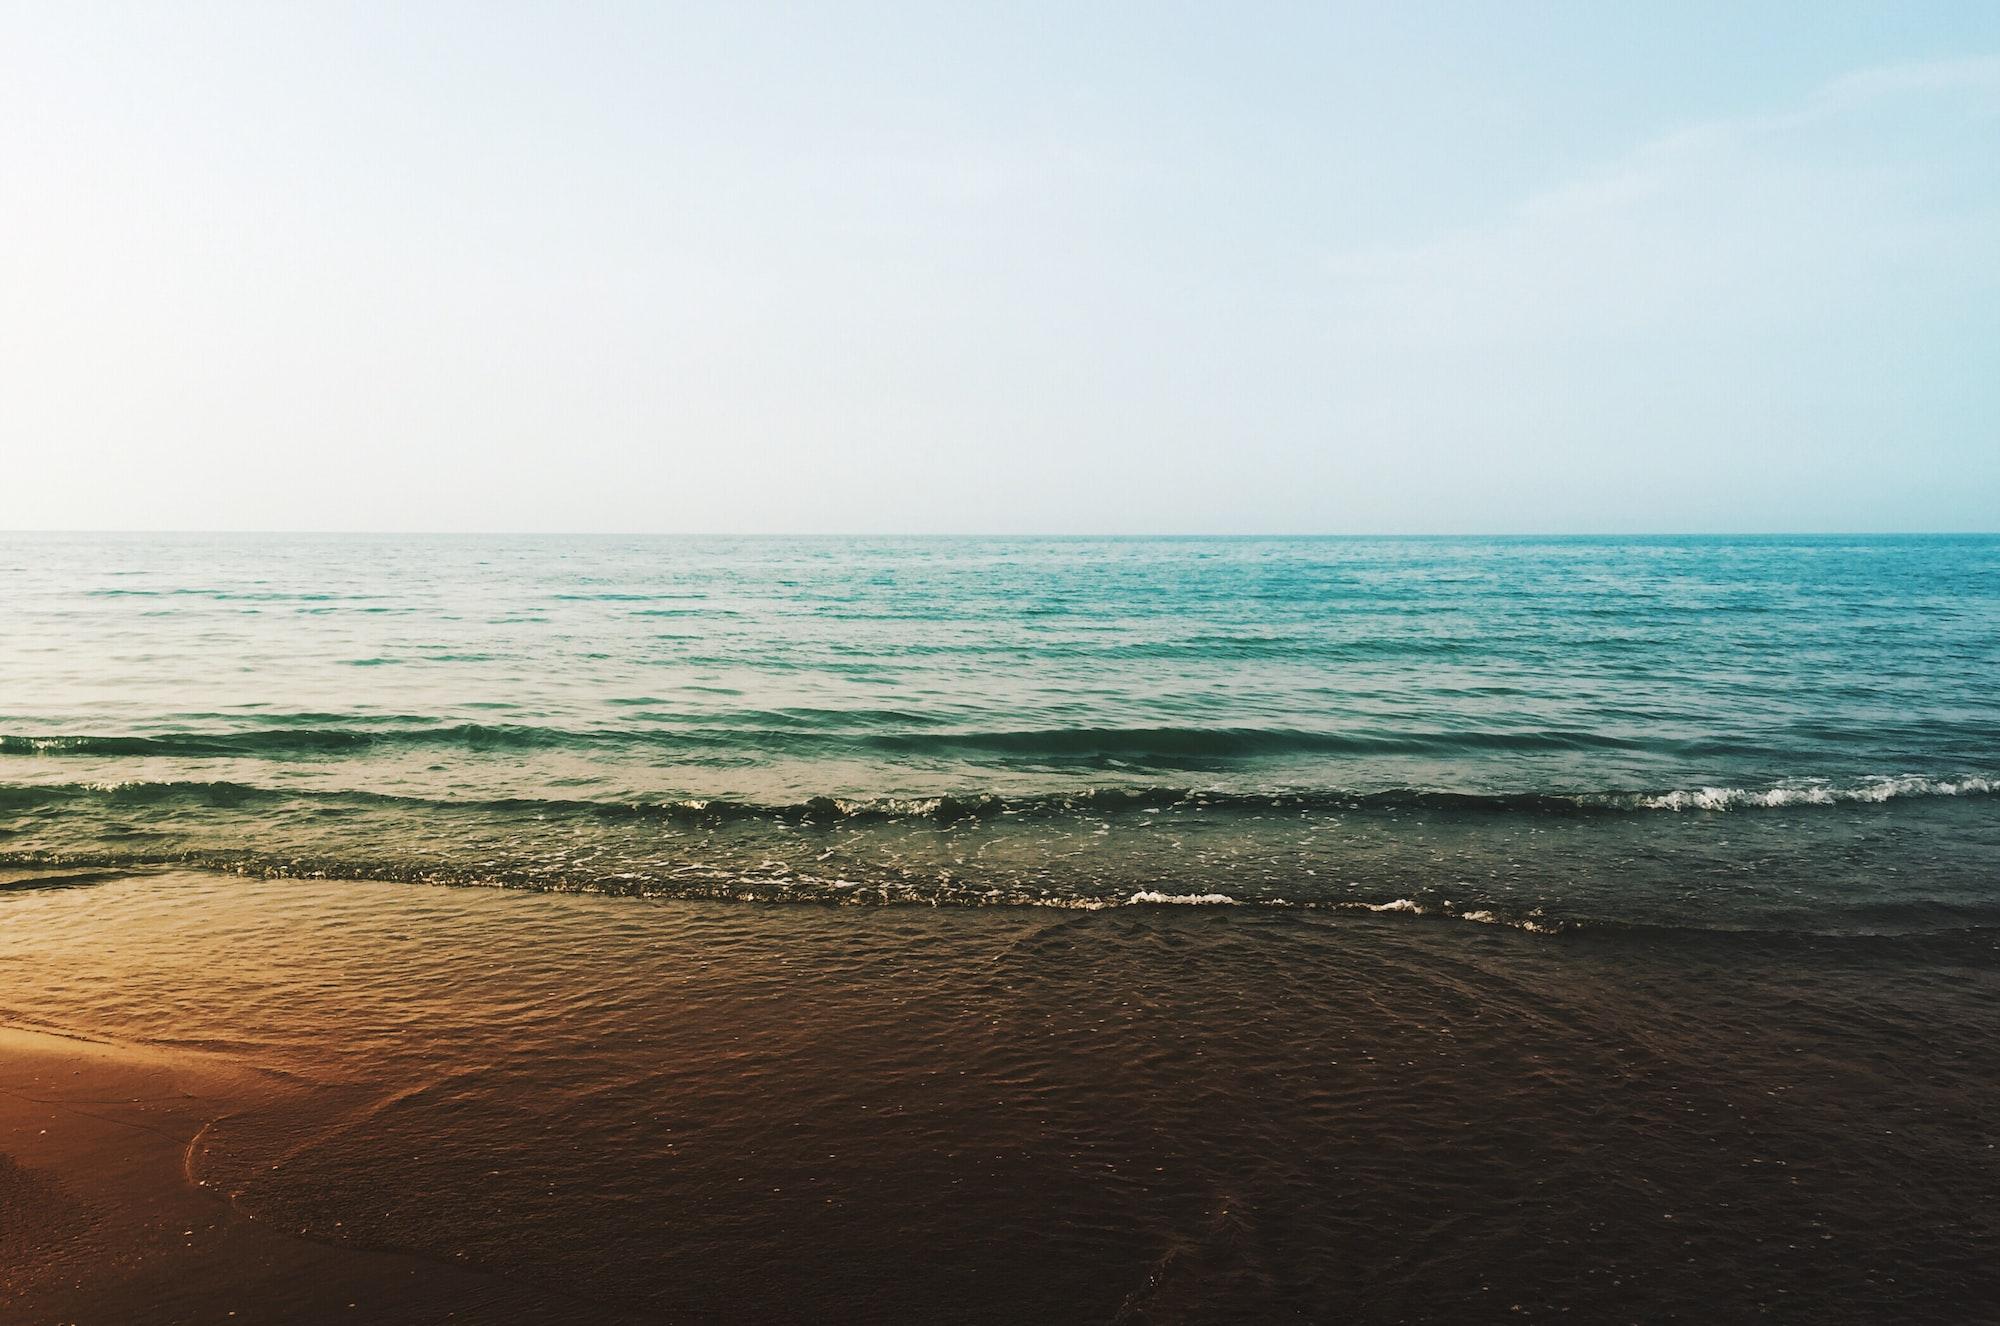 Chaboksar beach